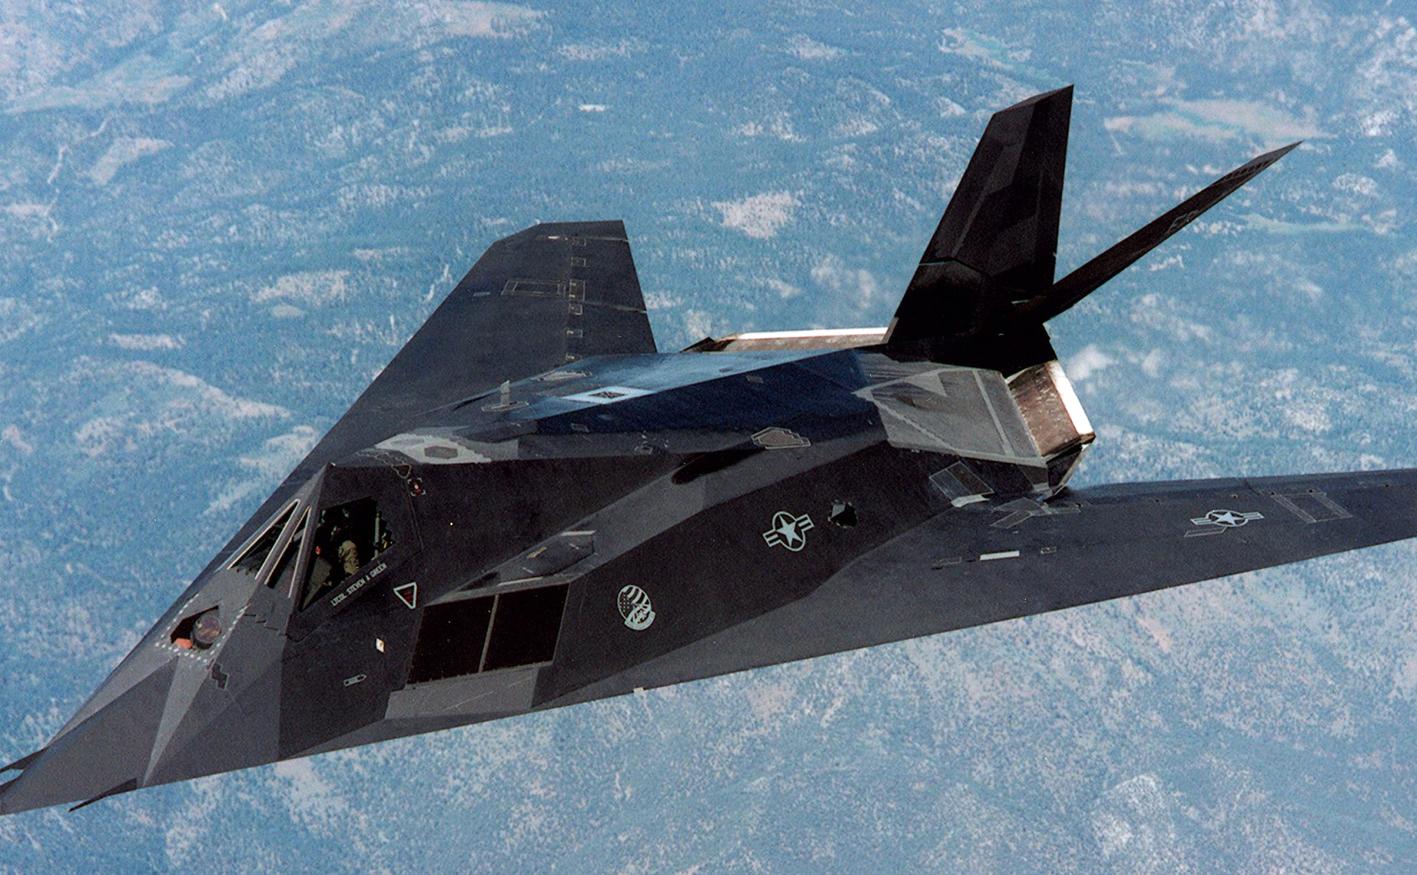 11 фактов об истребителе F-117